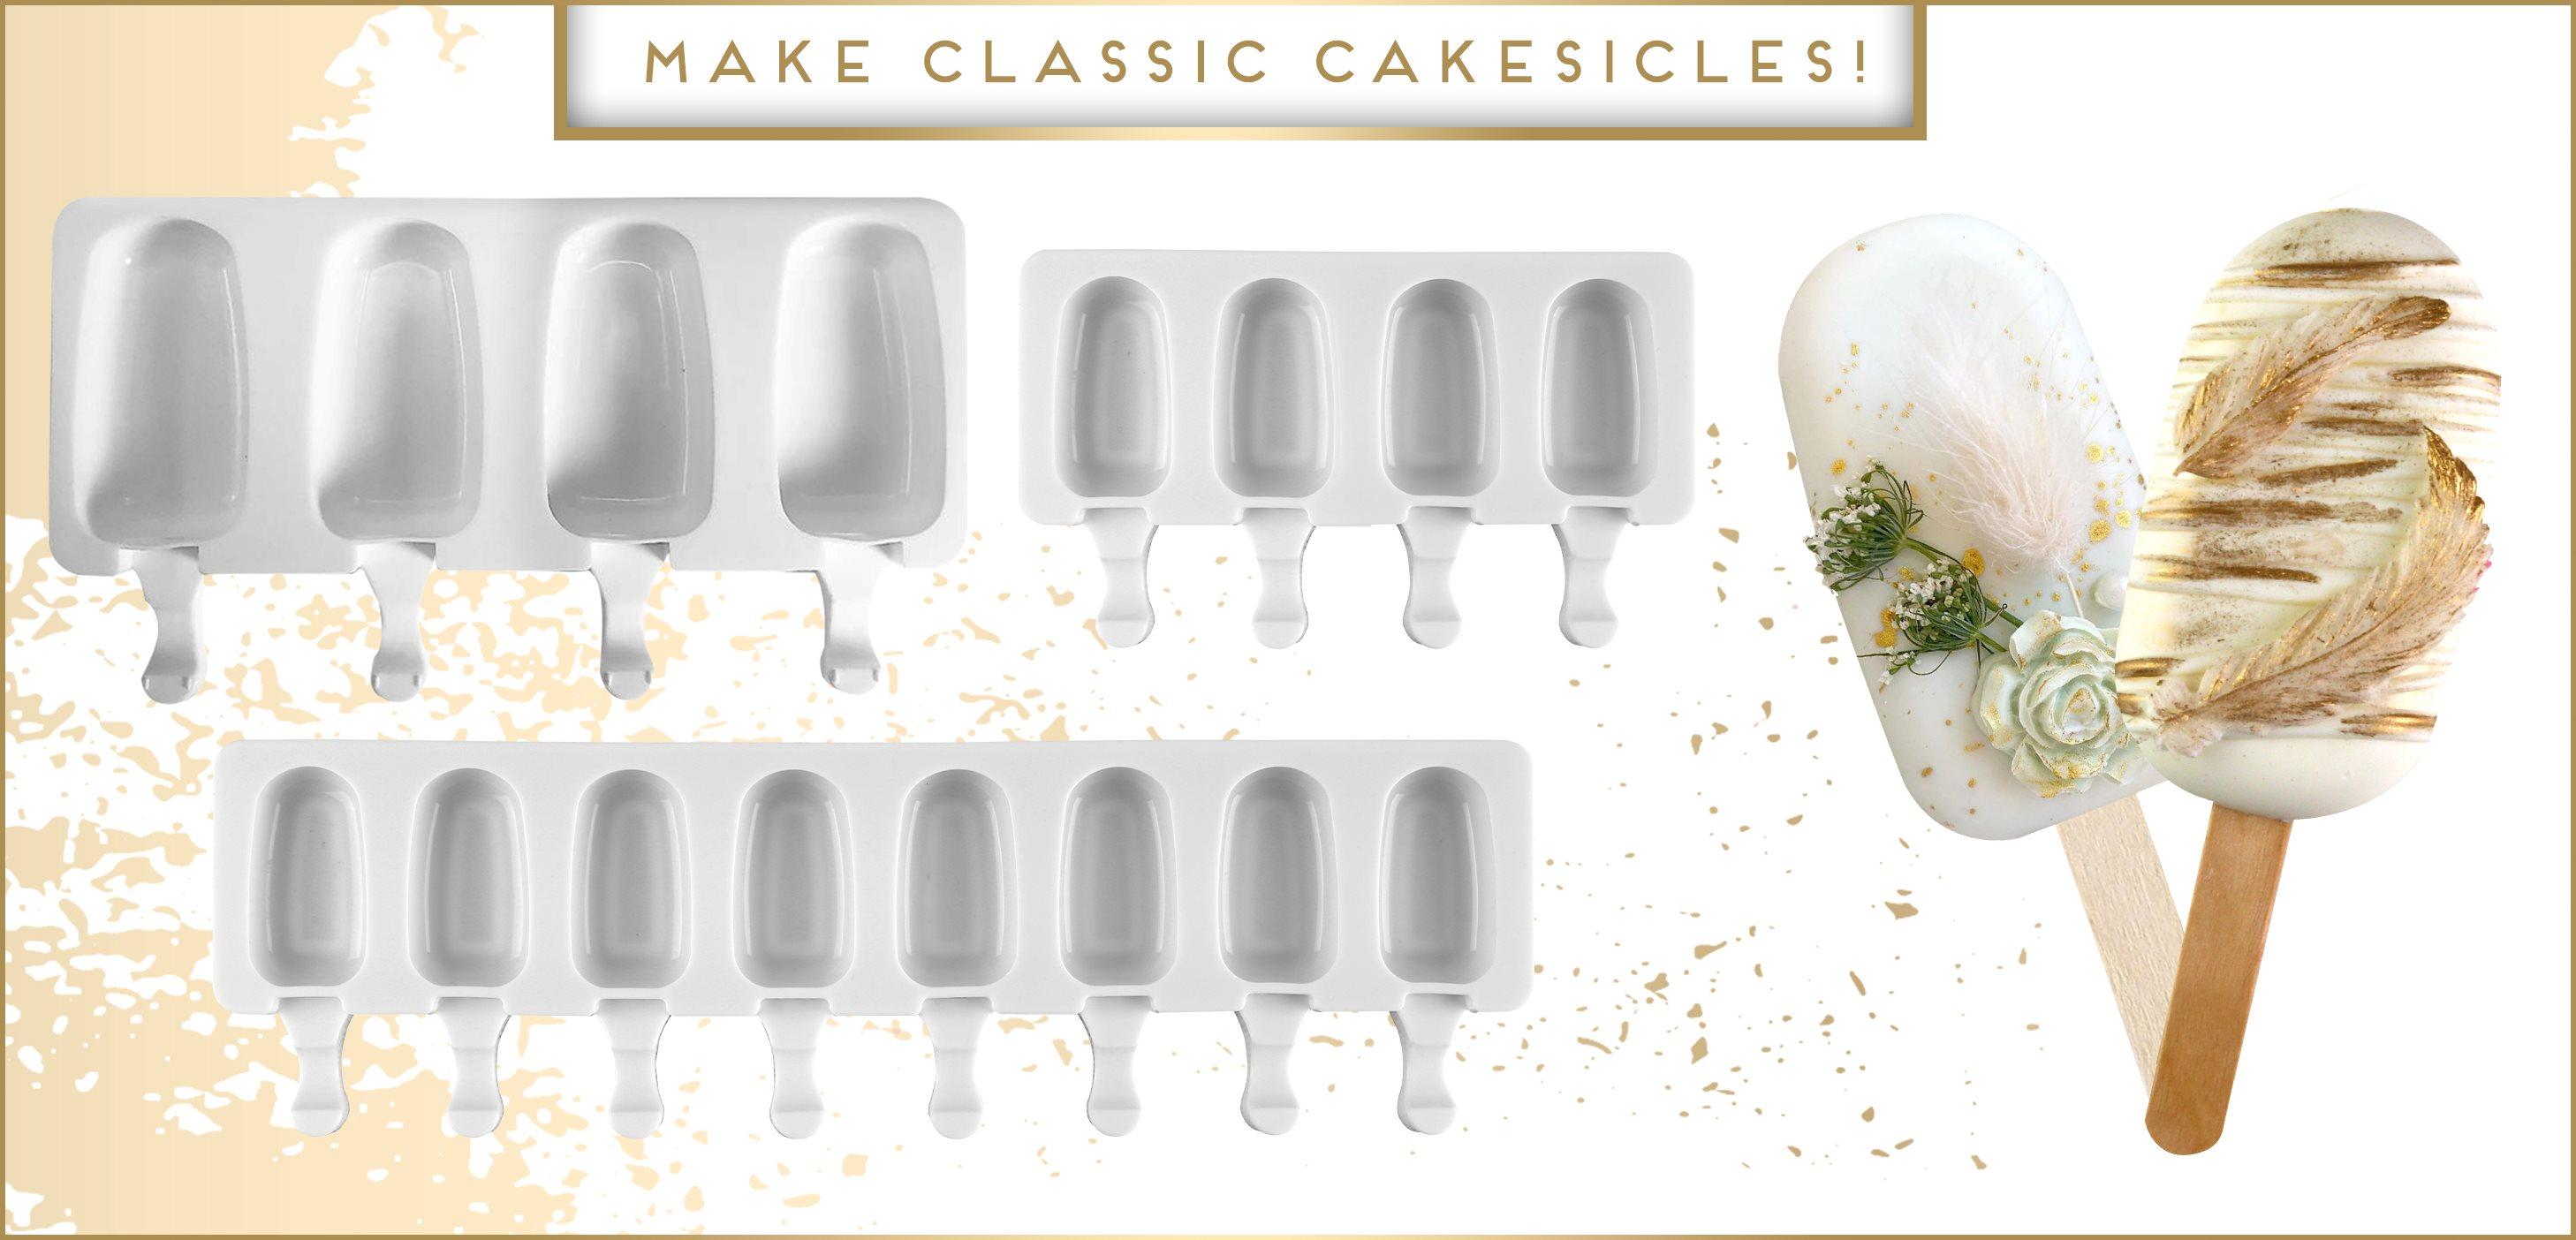 Classic Cakesicle Premiere Shape Mold Mini 4 and 8 Cavity